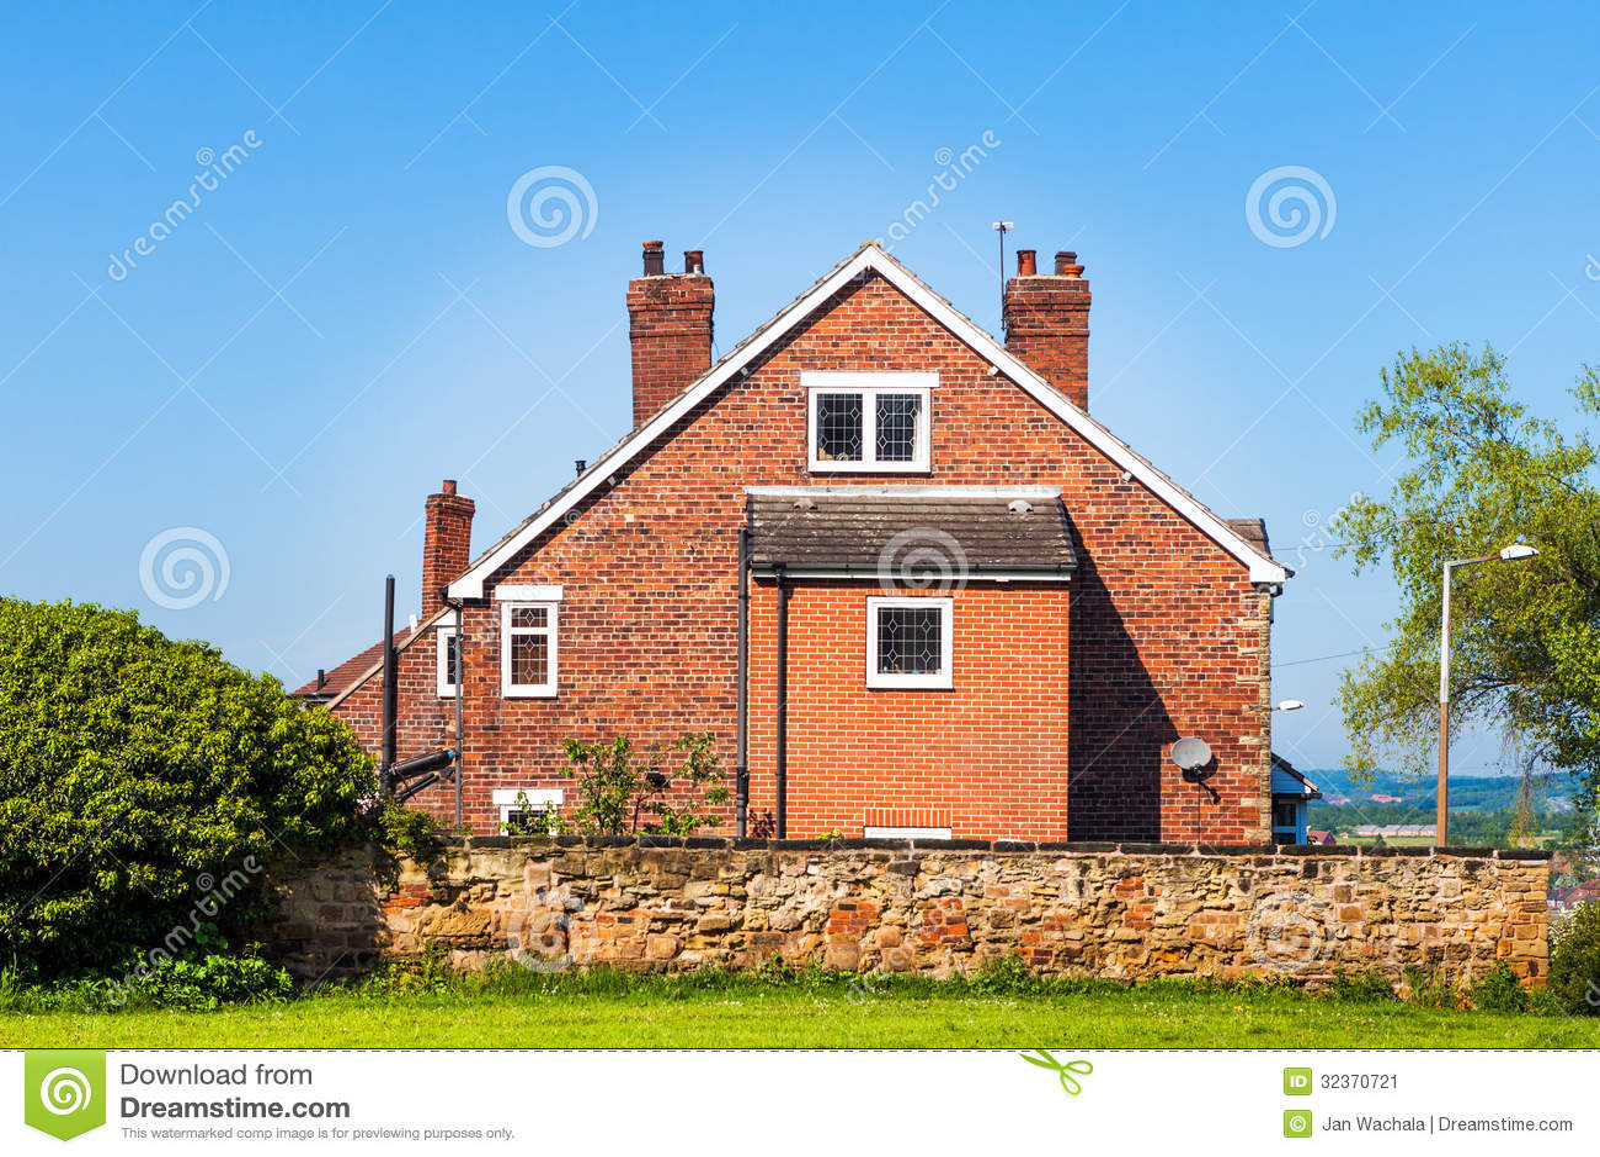 Maison anglaise typique image stock image 32370721 - Maison anglaise typique ...